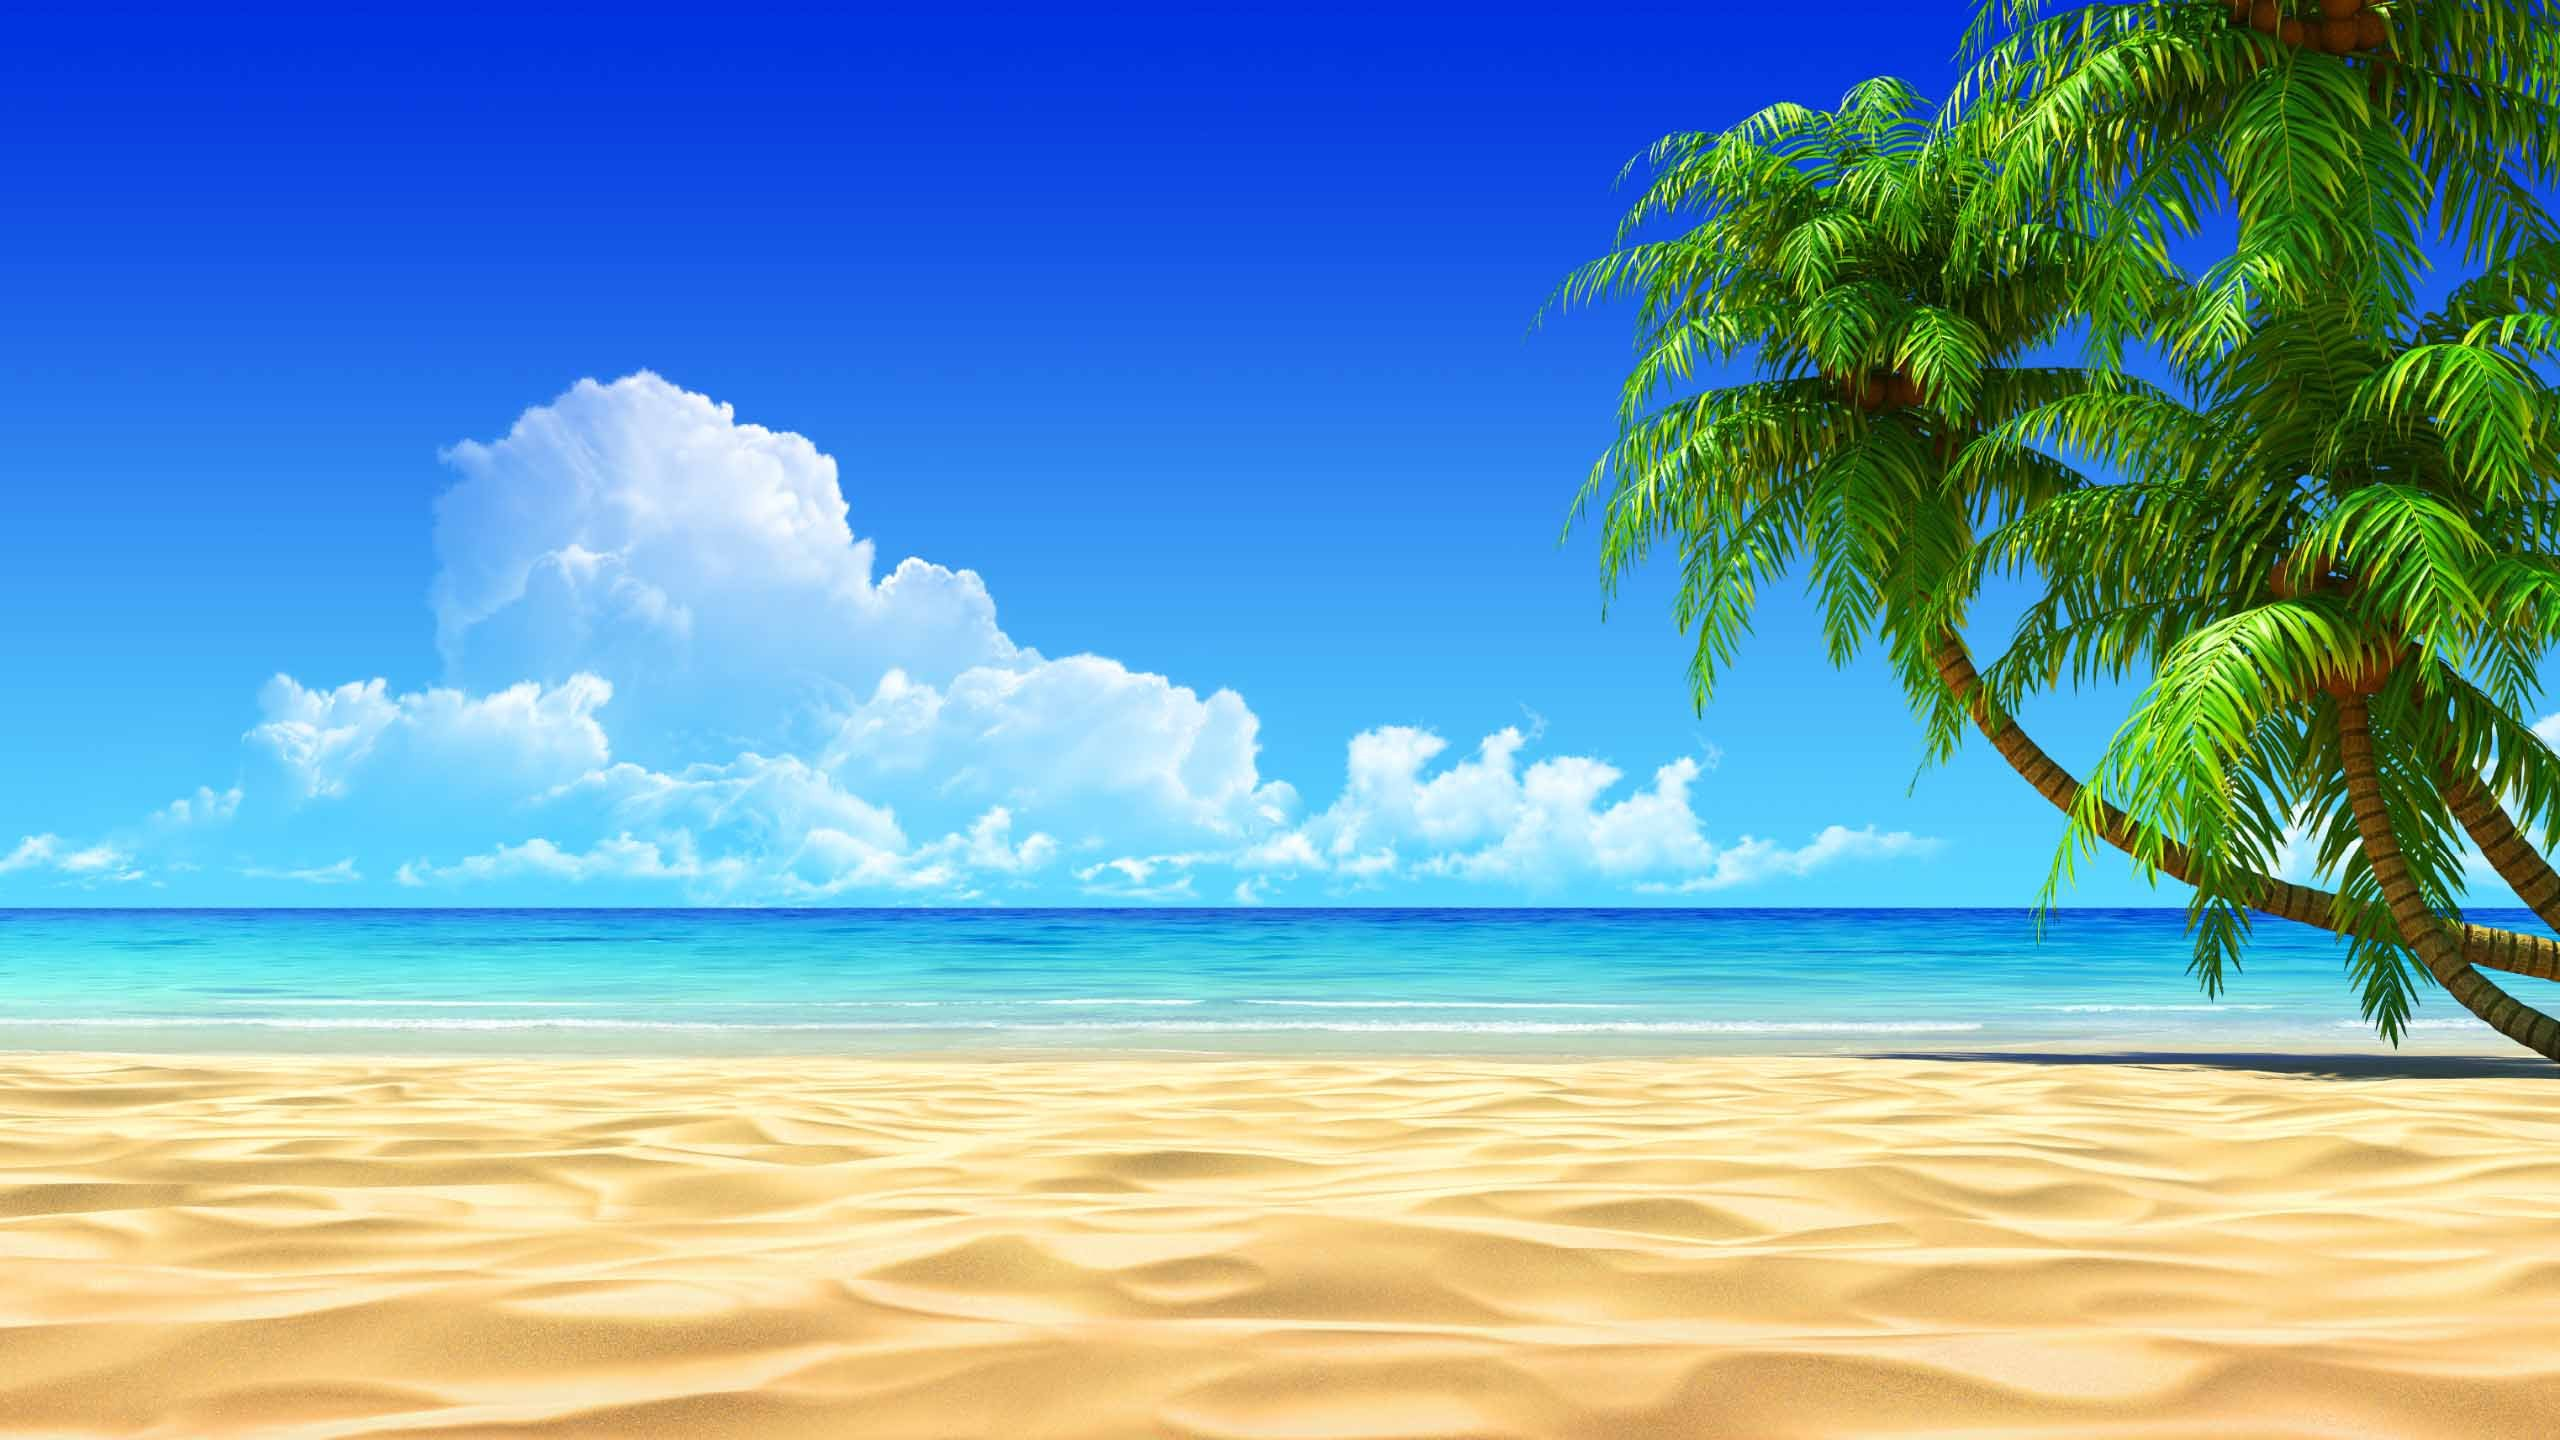 Palm Tree Screensaver Download Wallpaper